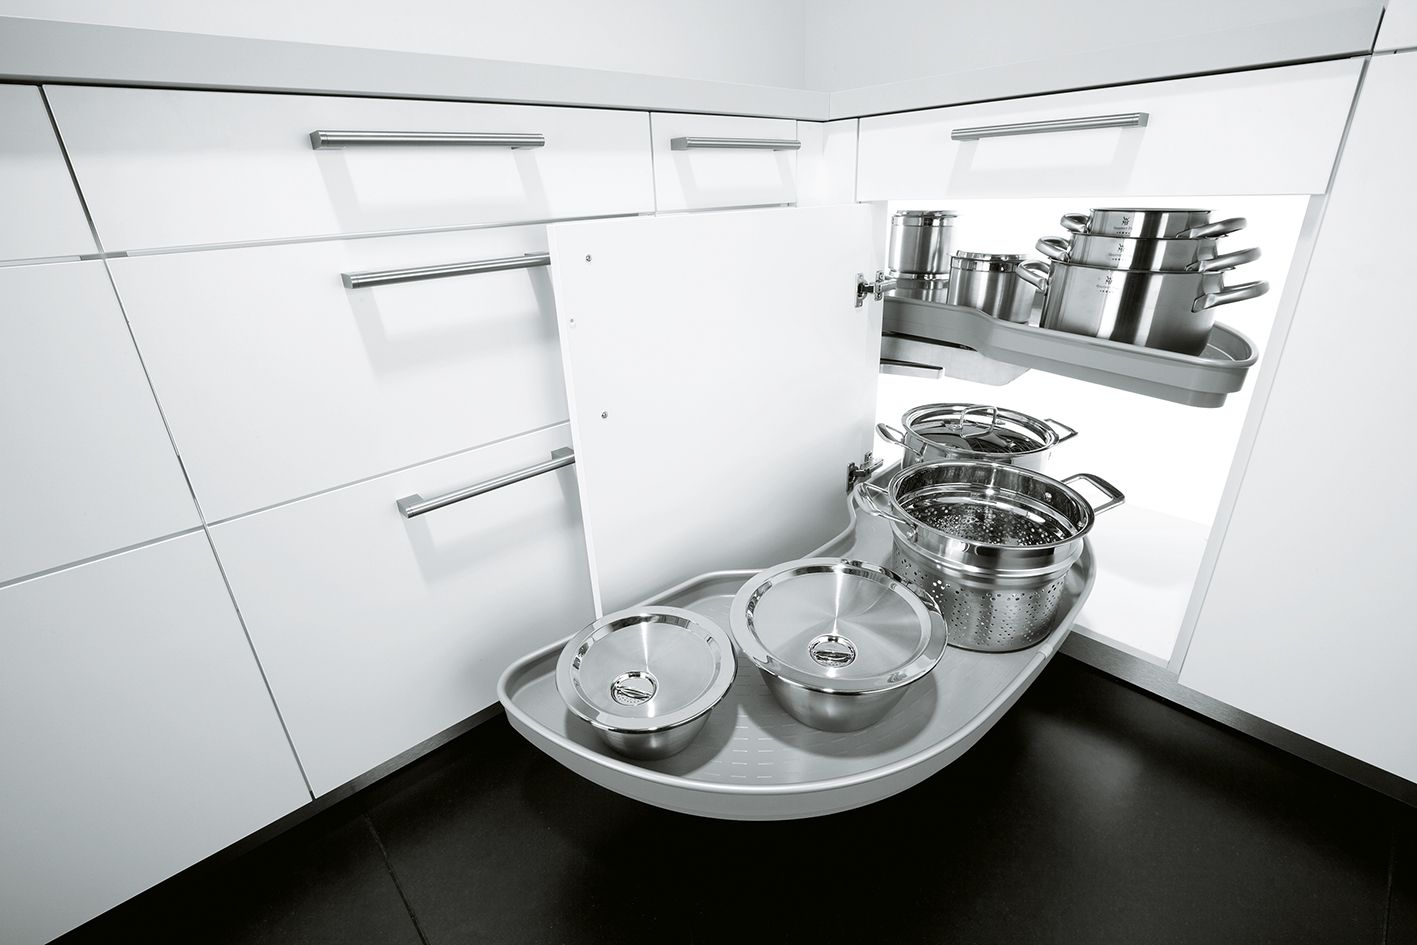 Swivelling sliding drawer | Mutfaklar | Pinterest | Kitchen storage ...